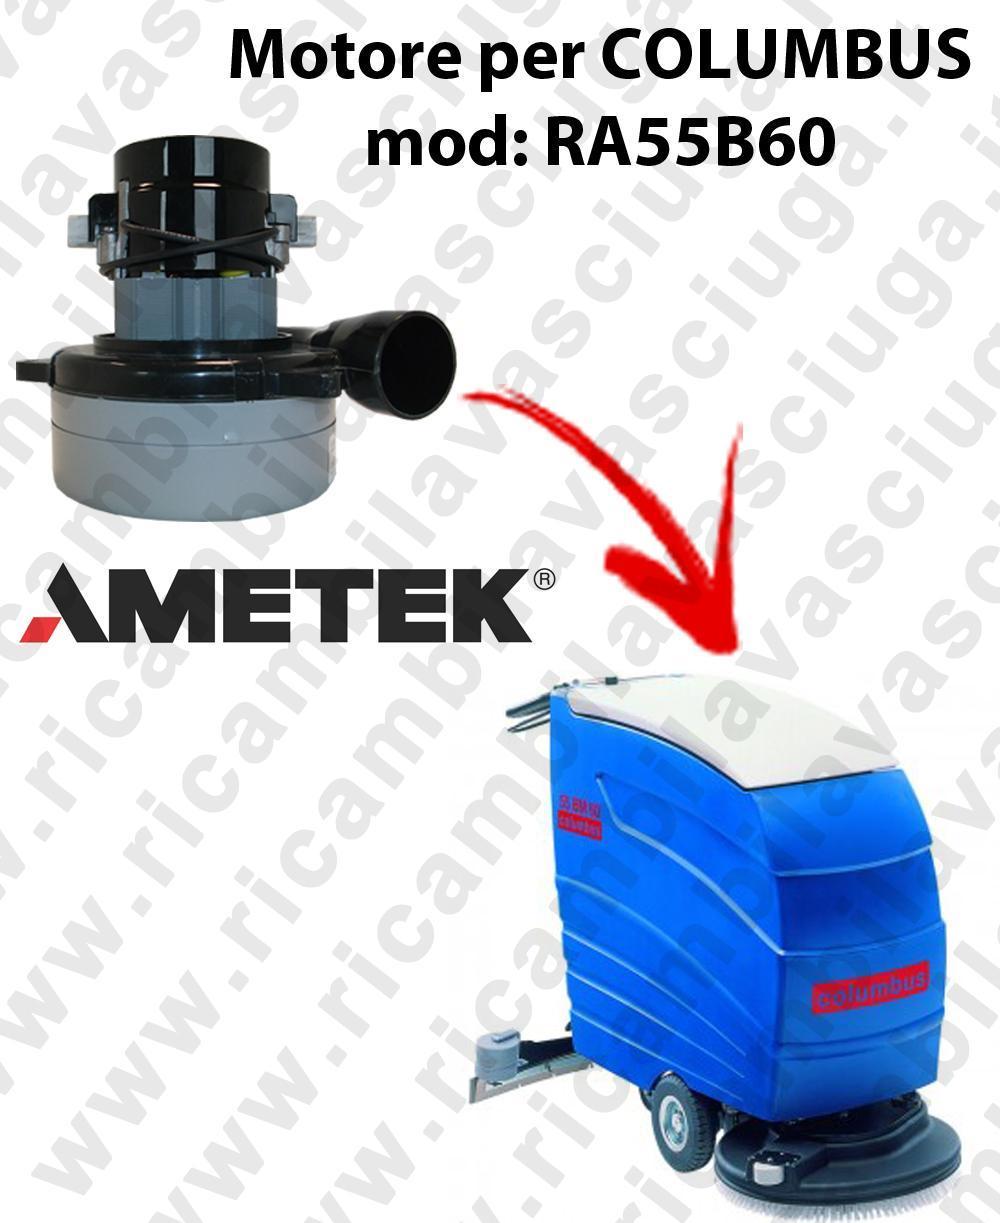 RA55B60 Motore de aspiración LAMB AMETEK para fregadora COLUMBUS